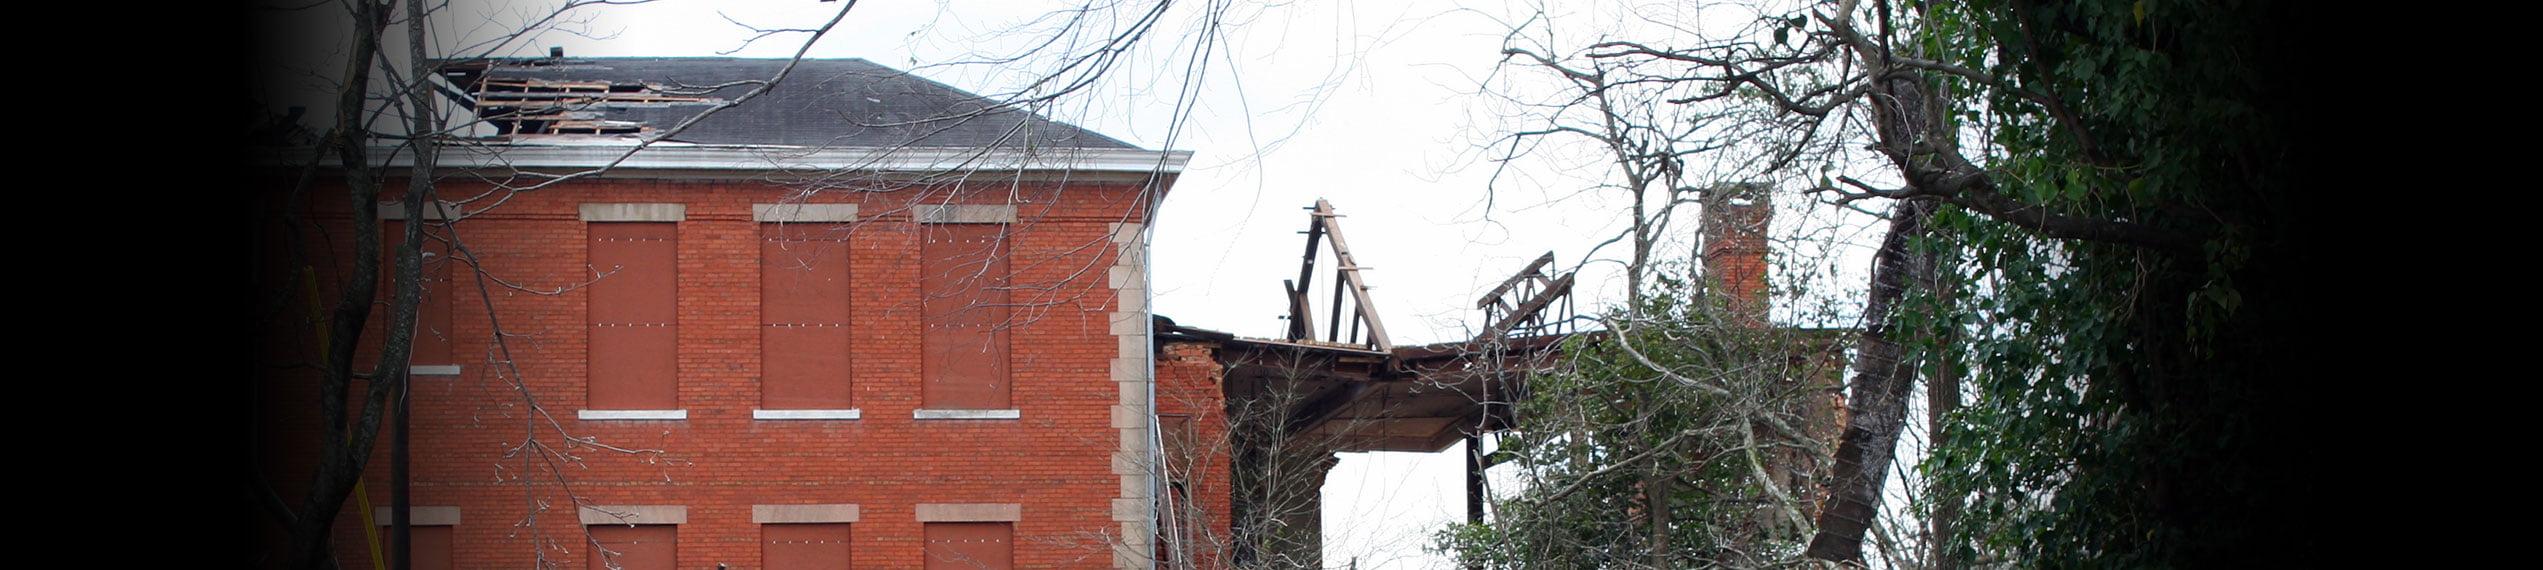 Wind & Storm Damage Repairs in Paul Davis Restoration & Remodeling of Greater Baltimore